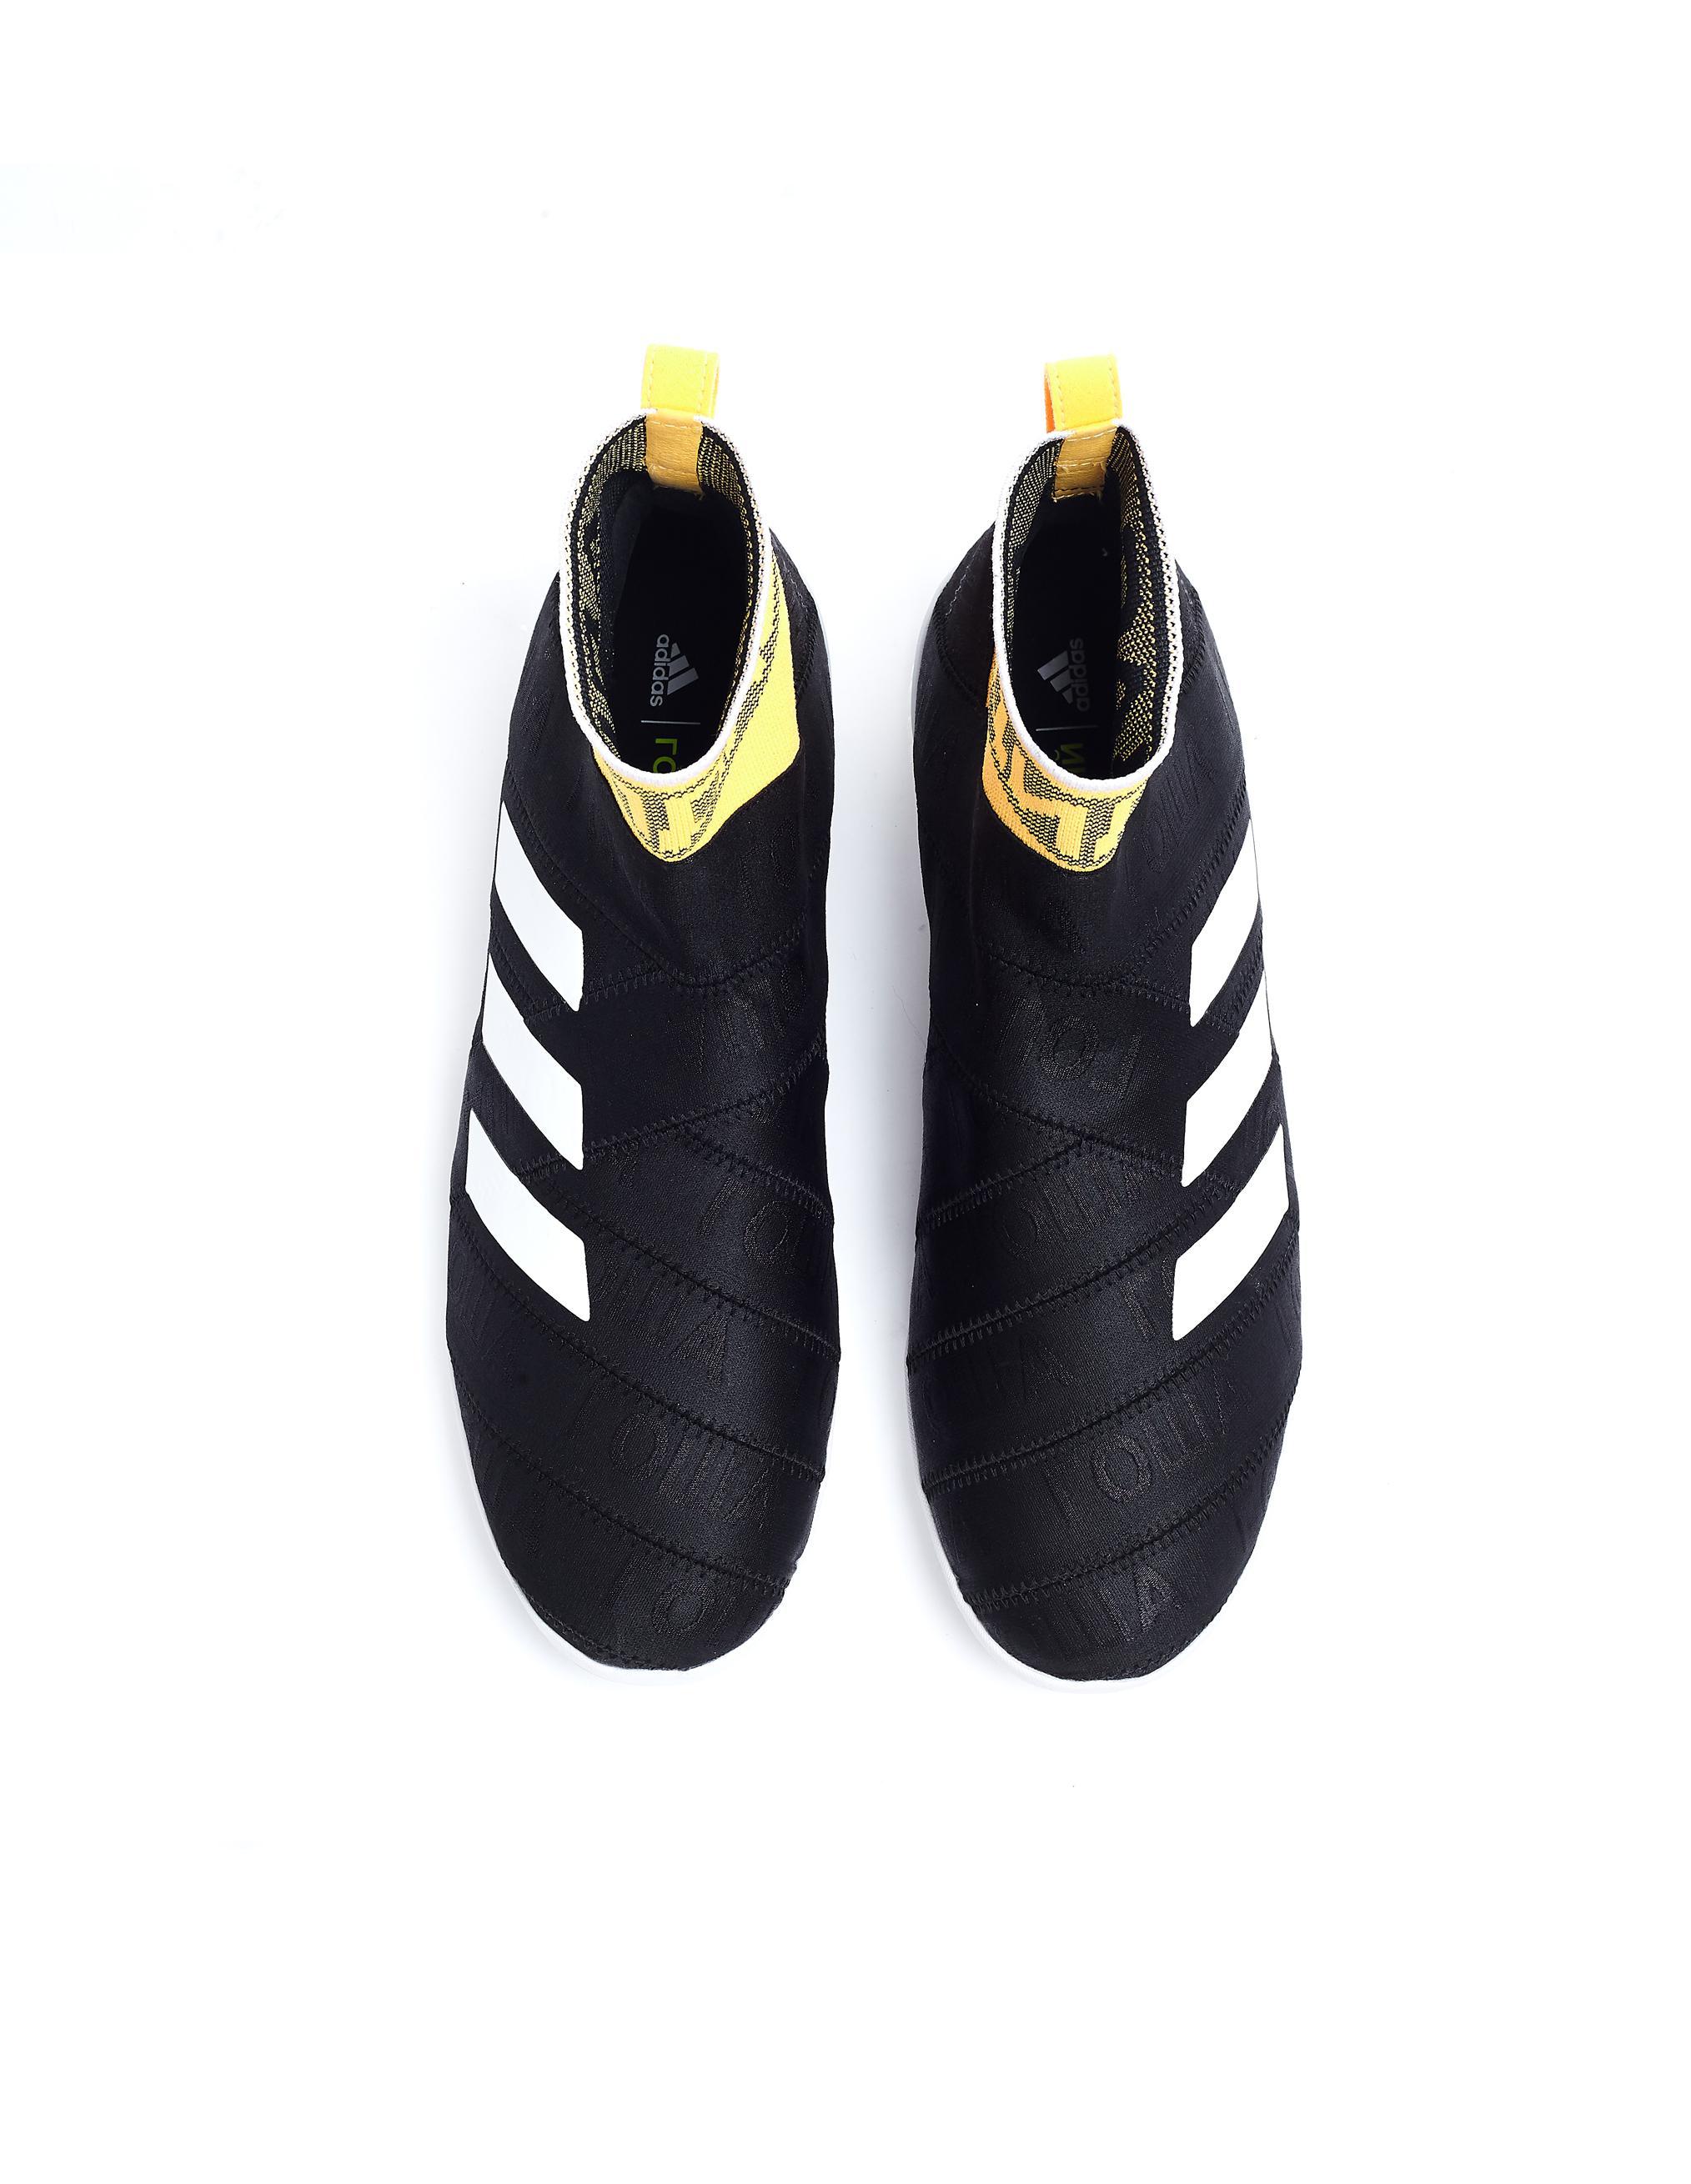 6b82e32276c3 Lyst - Gosha Rubchinskiy High-top Nemeziz Sneakers in Black for Men - Save  3%